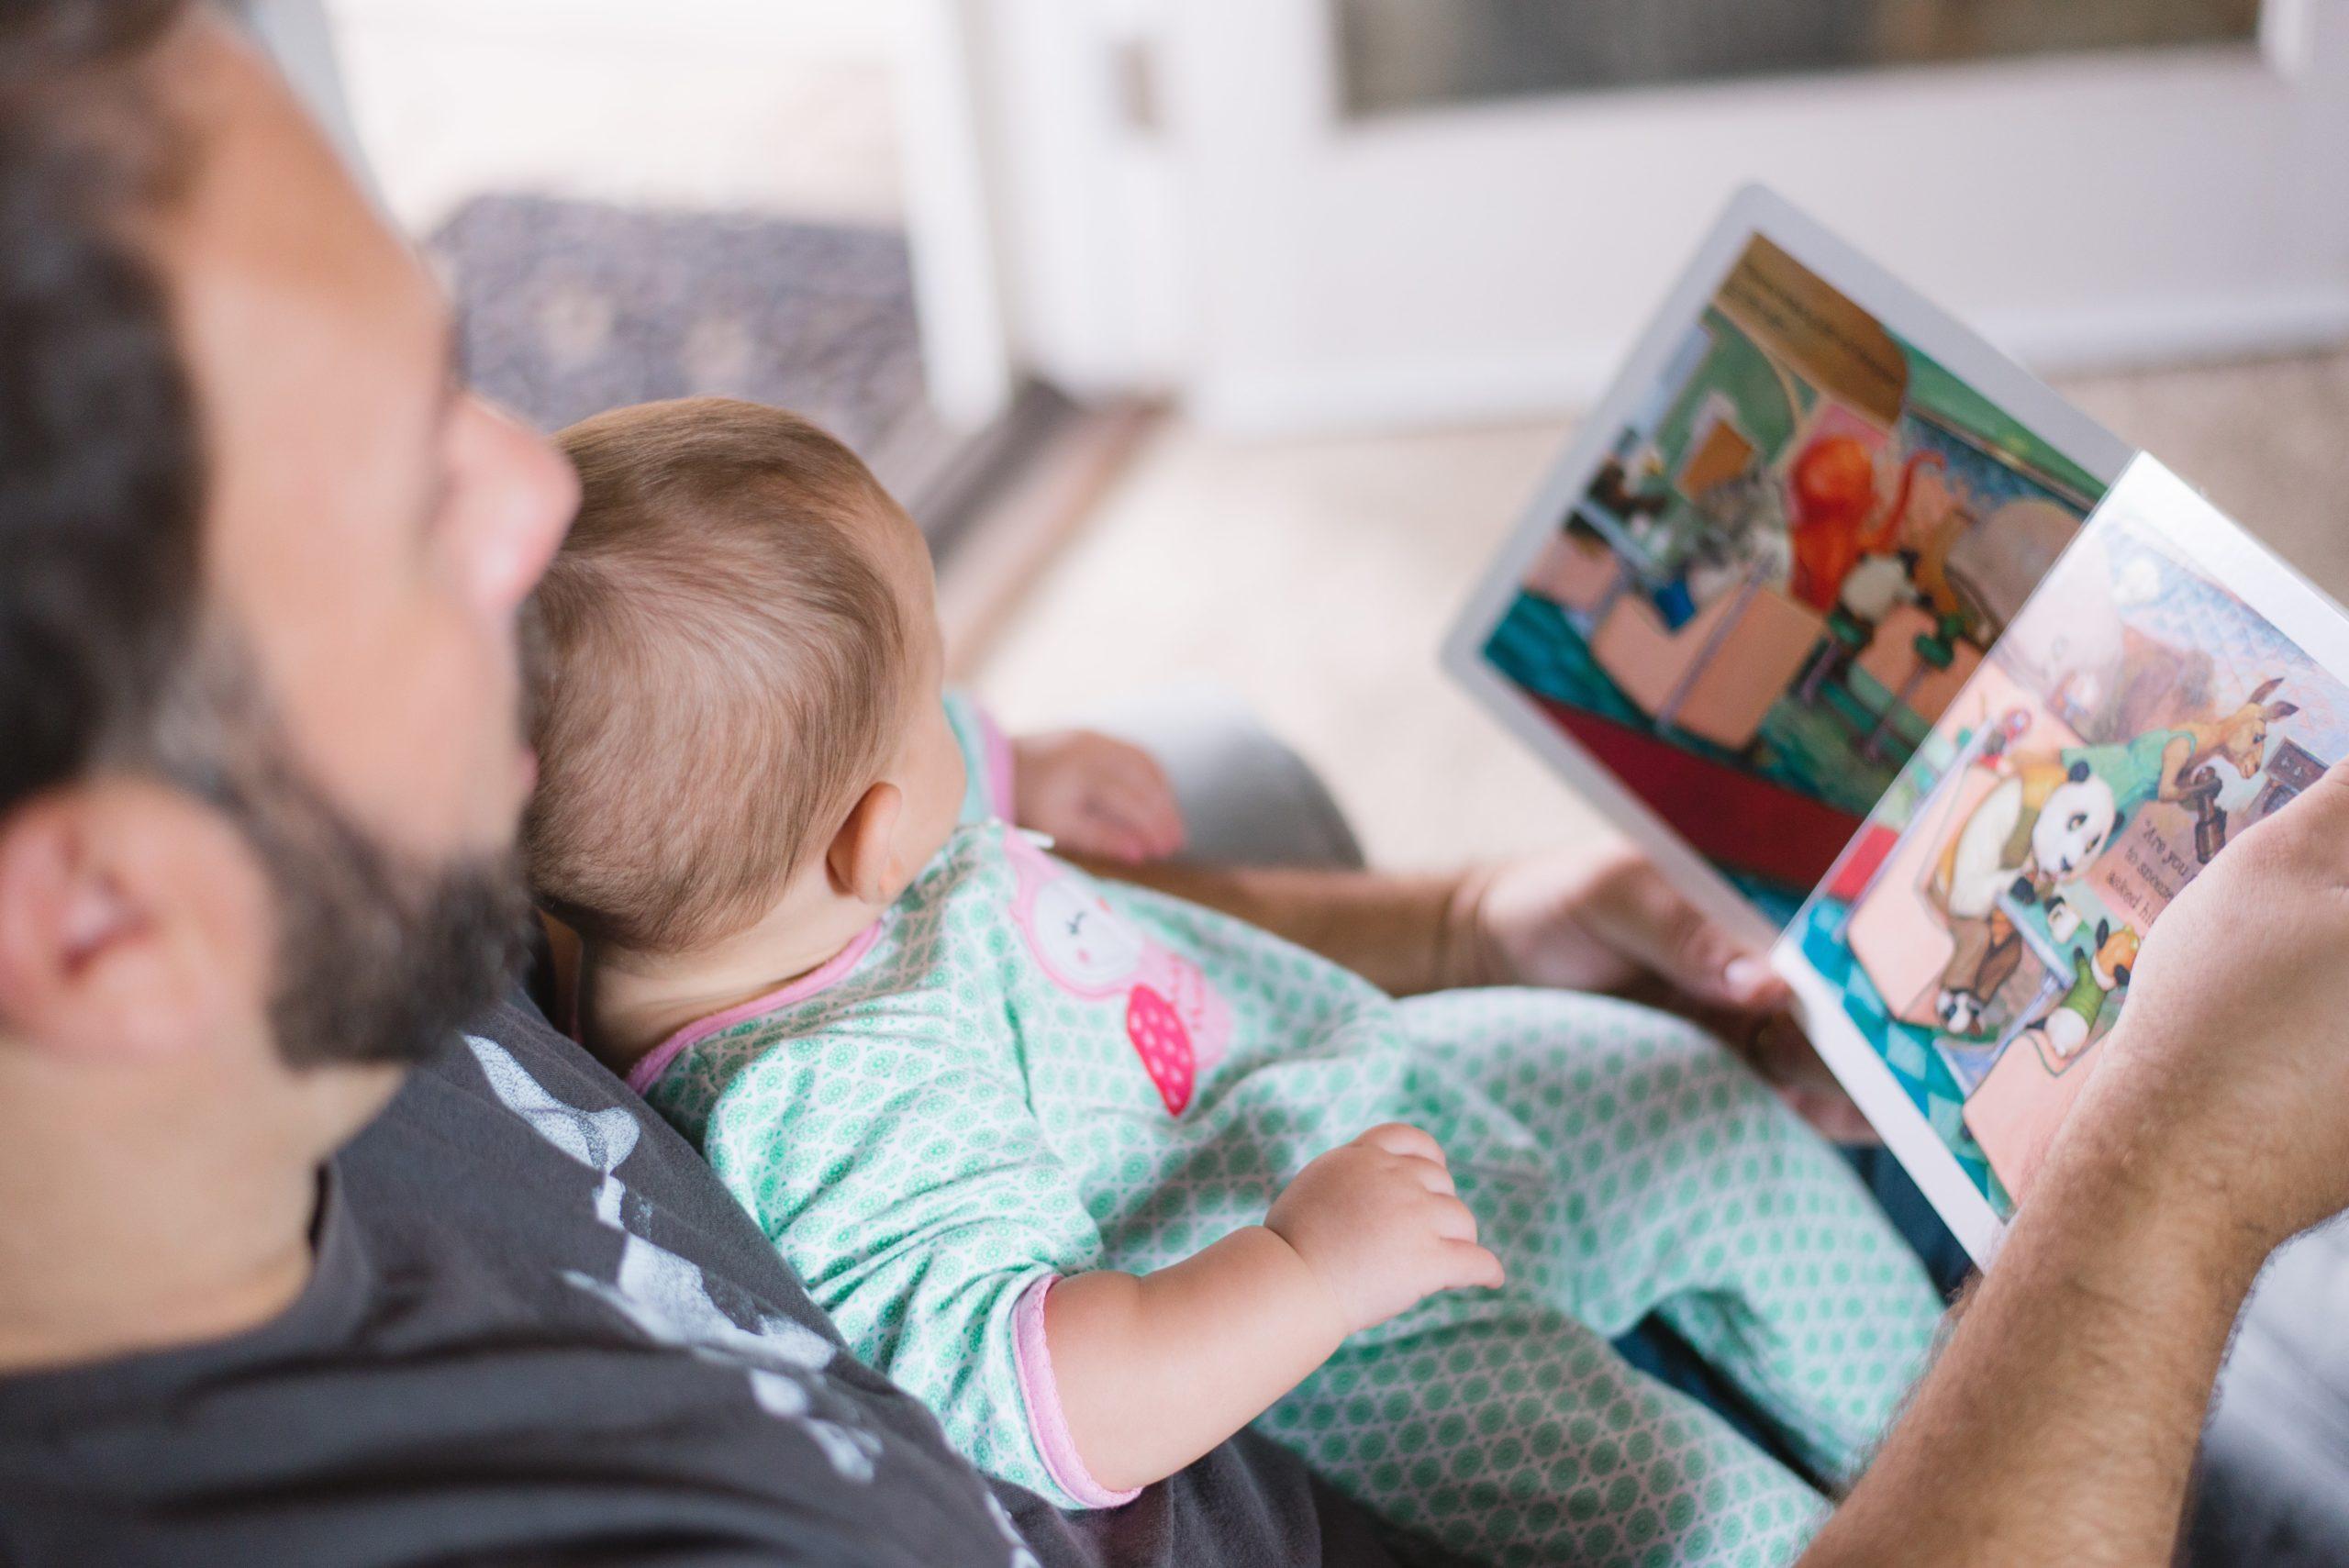 lecturas_padres_hijos_mjasensio